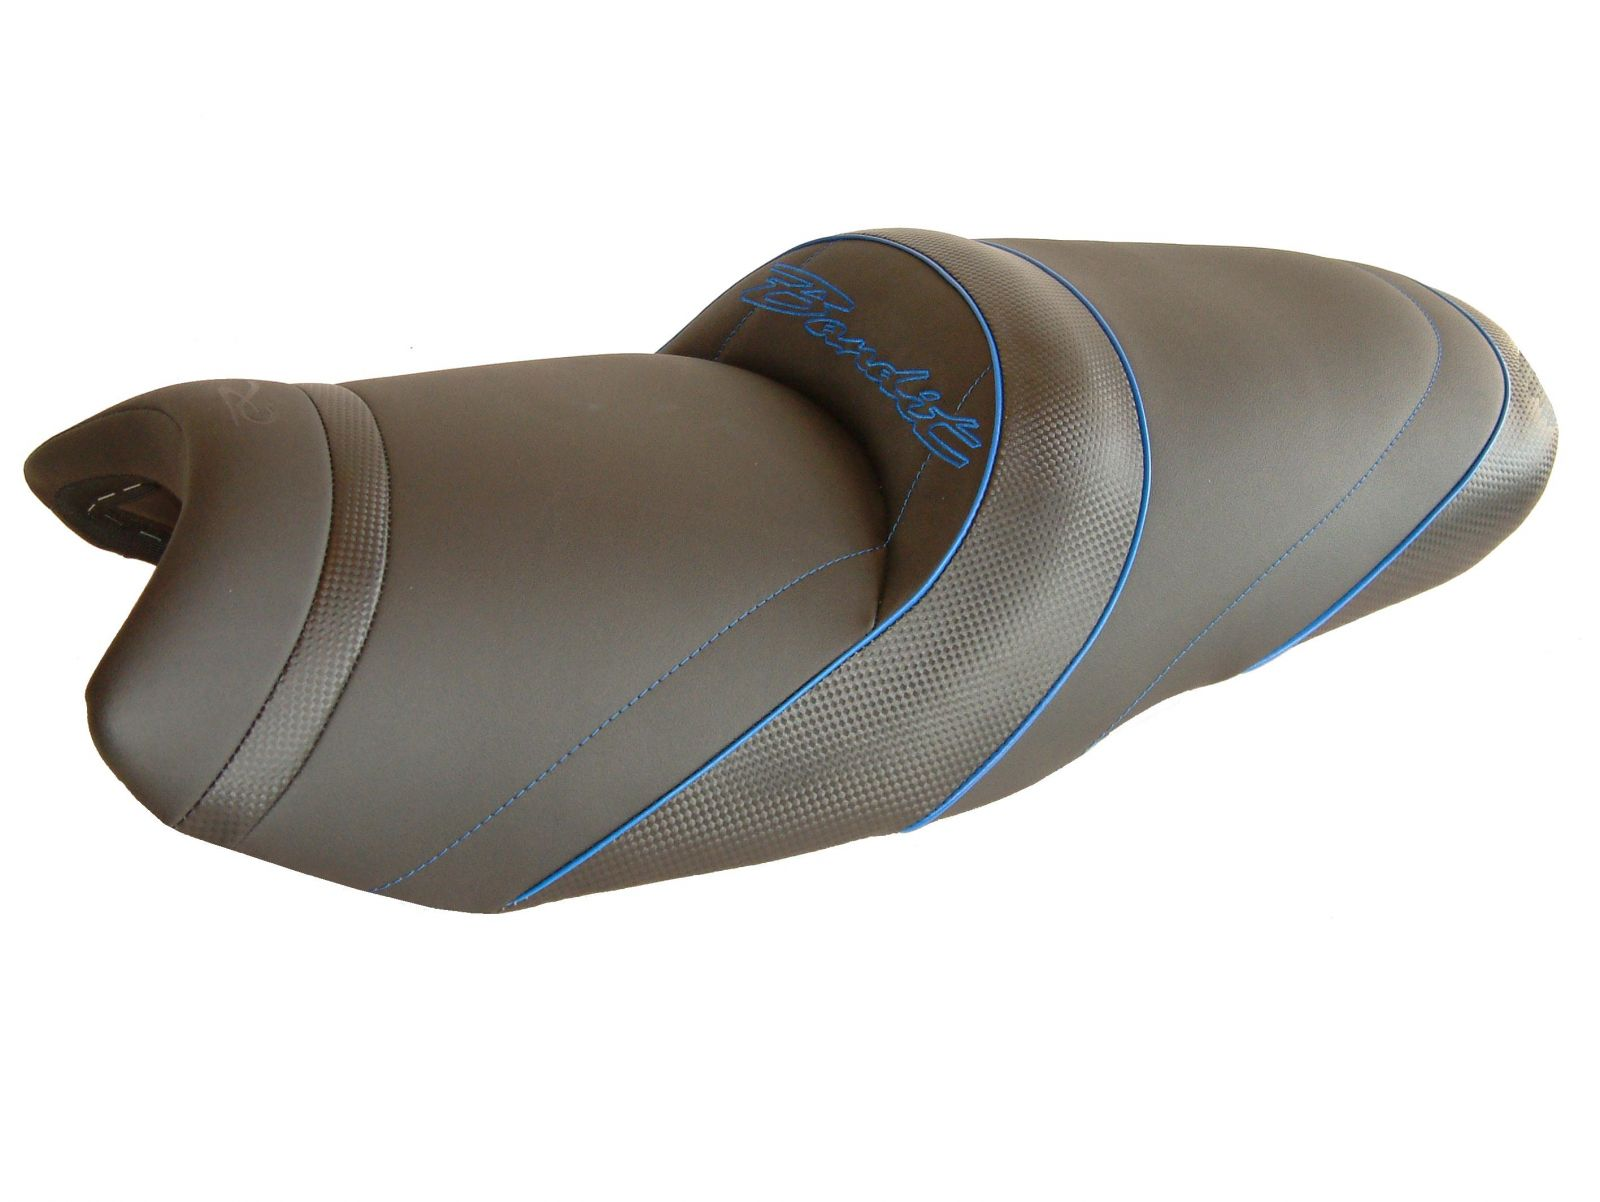 Sella Grande Confort SGC1292 - SUZUKI BANDIT 600 [2000-2004]